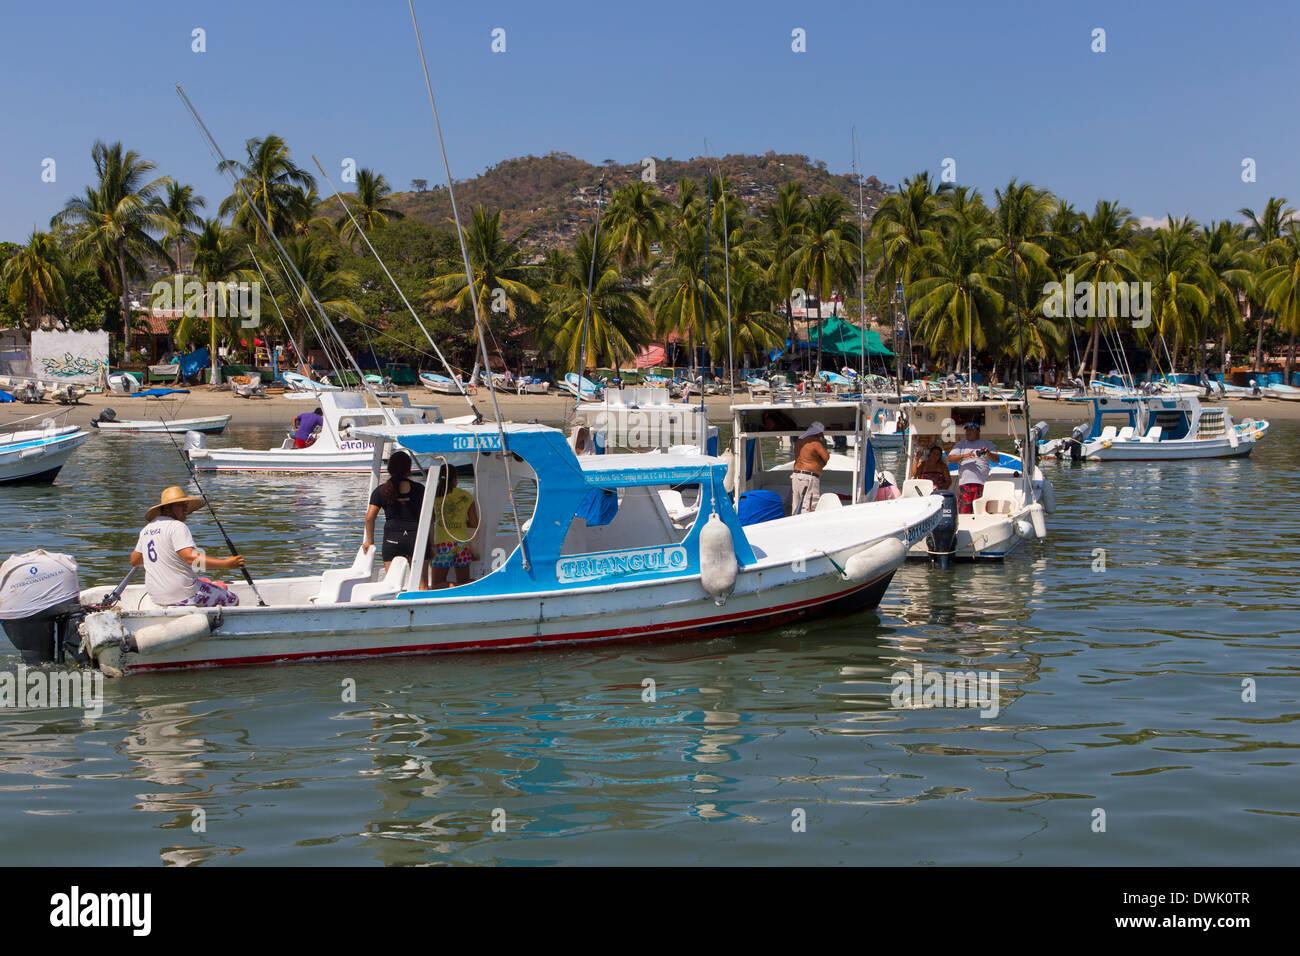 Angeln, Zihuatanejo, Ixtapa, Guerrero, Mexiko Stockbild